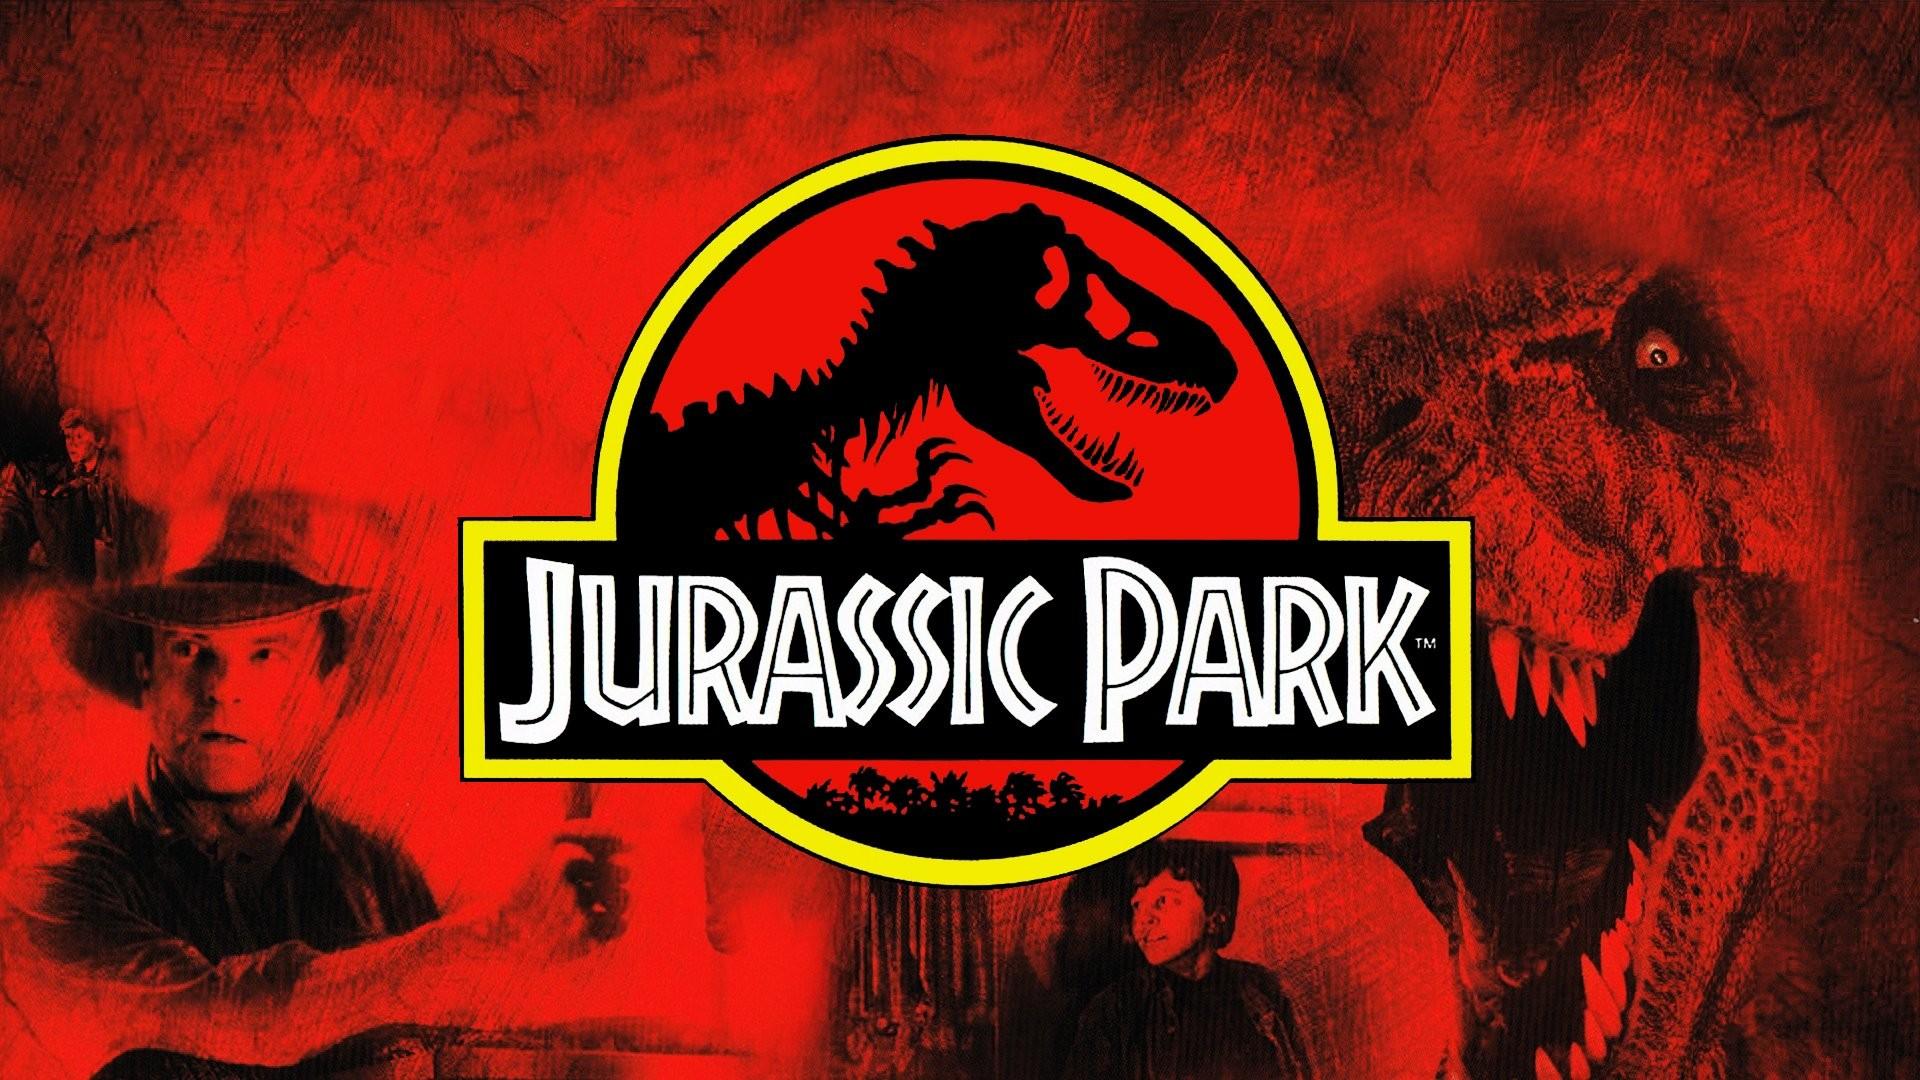 Res: 1920x1080, Jurassic Park Wallpaper